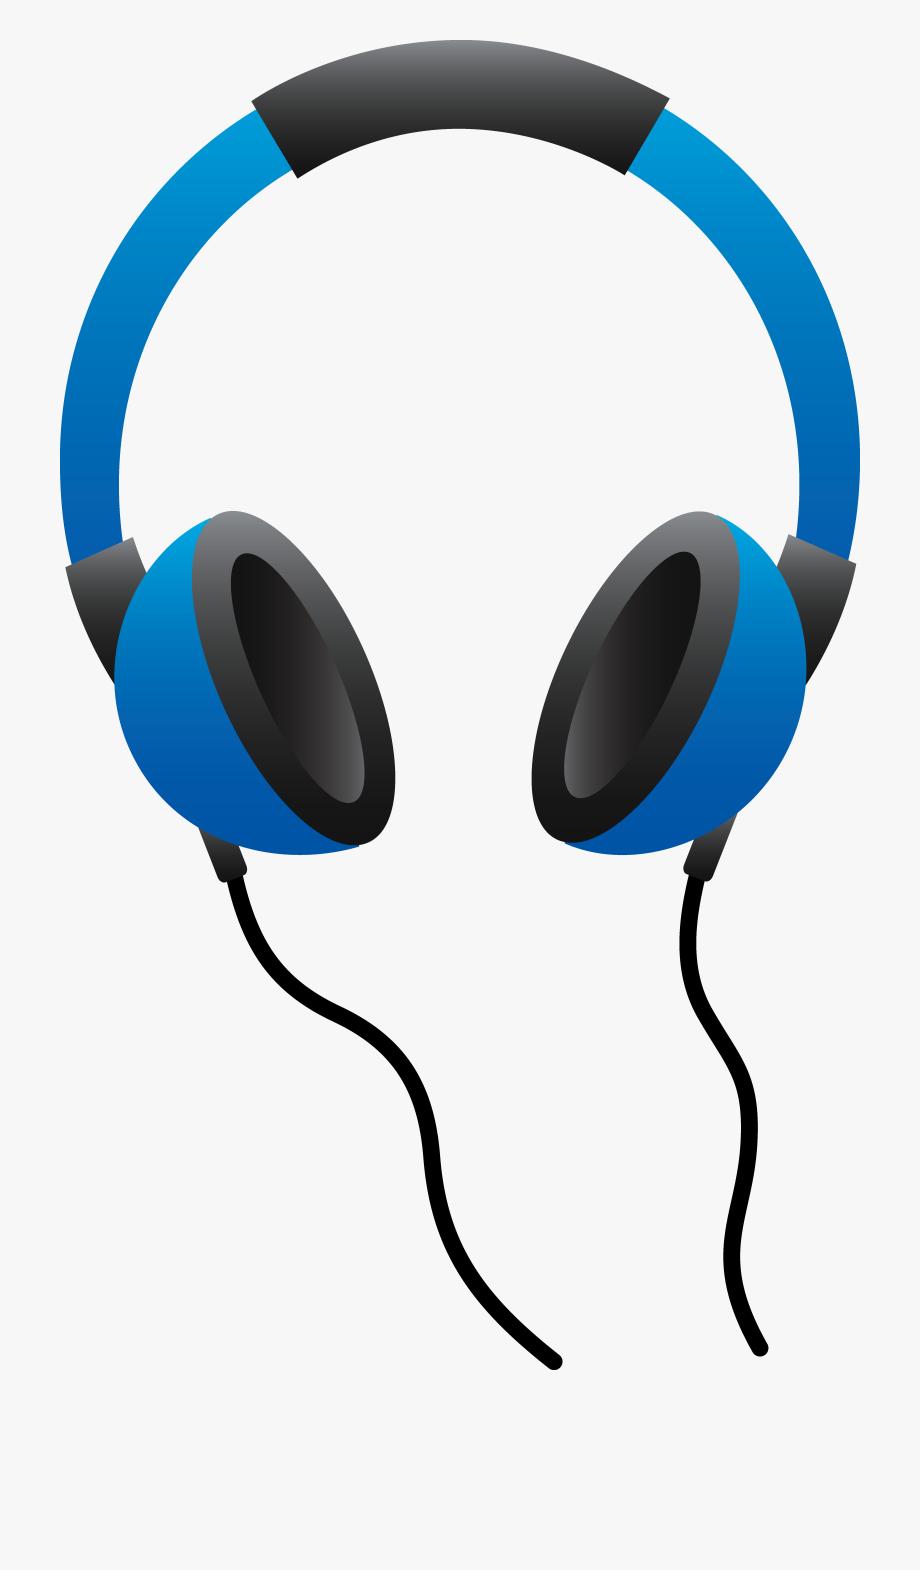 Audio clip art free. Headphones clipart sound bar